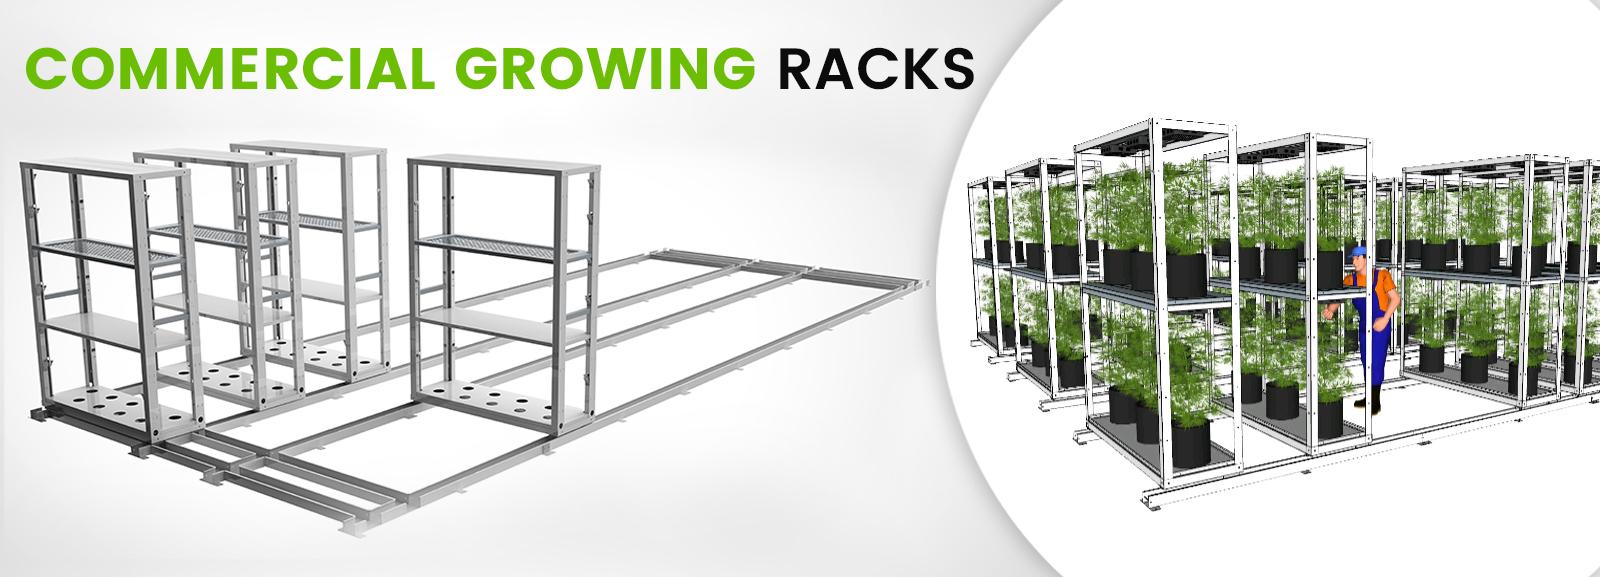 Commercial Growing Racks